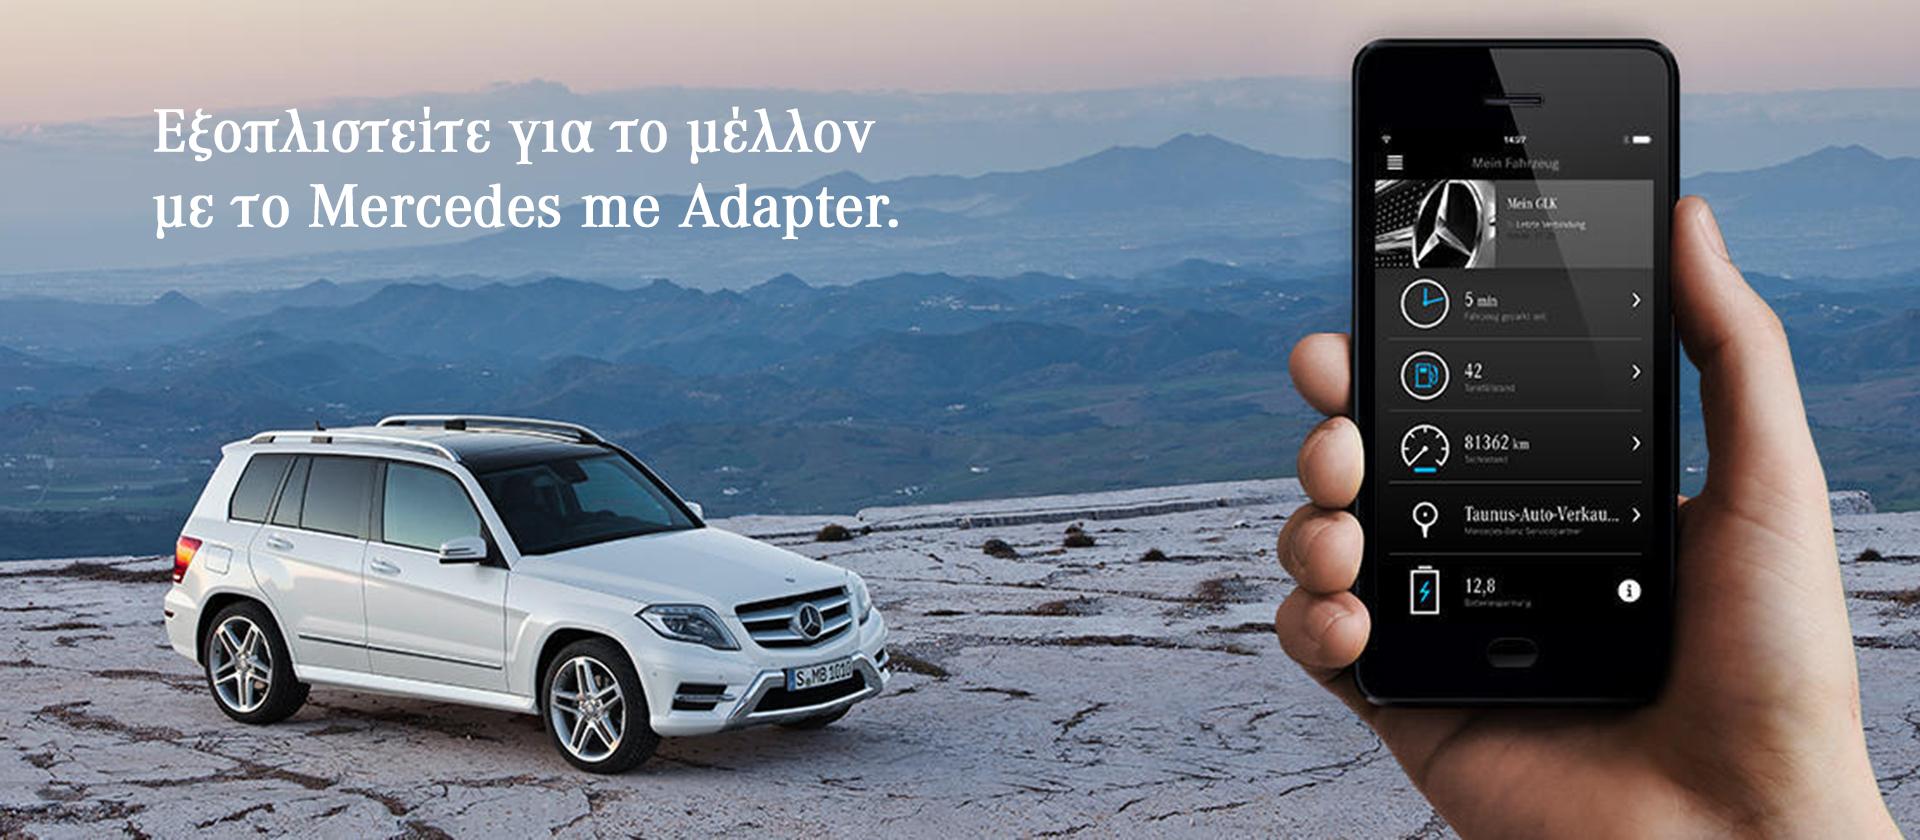 Mercedes.me Adapter